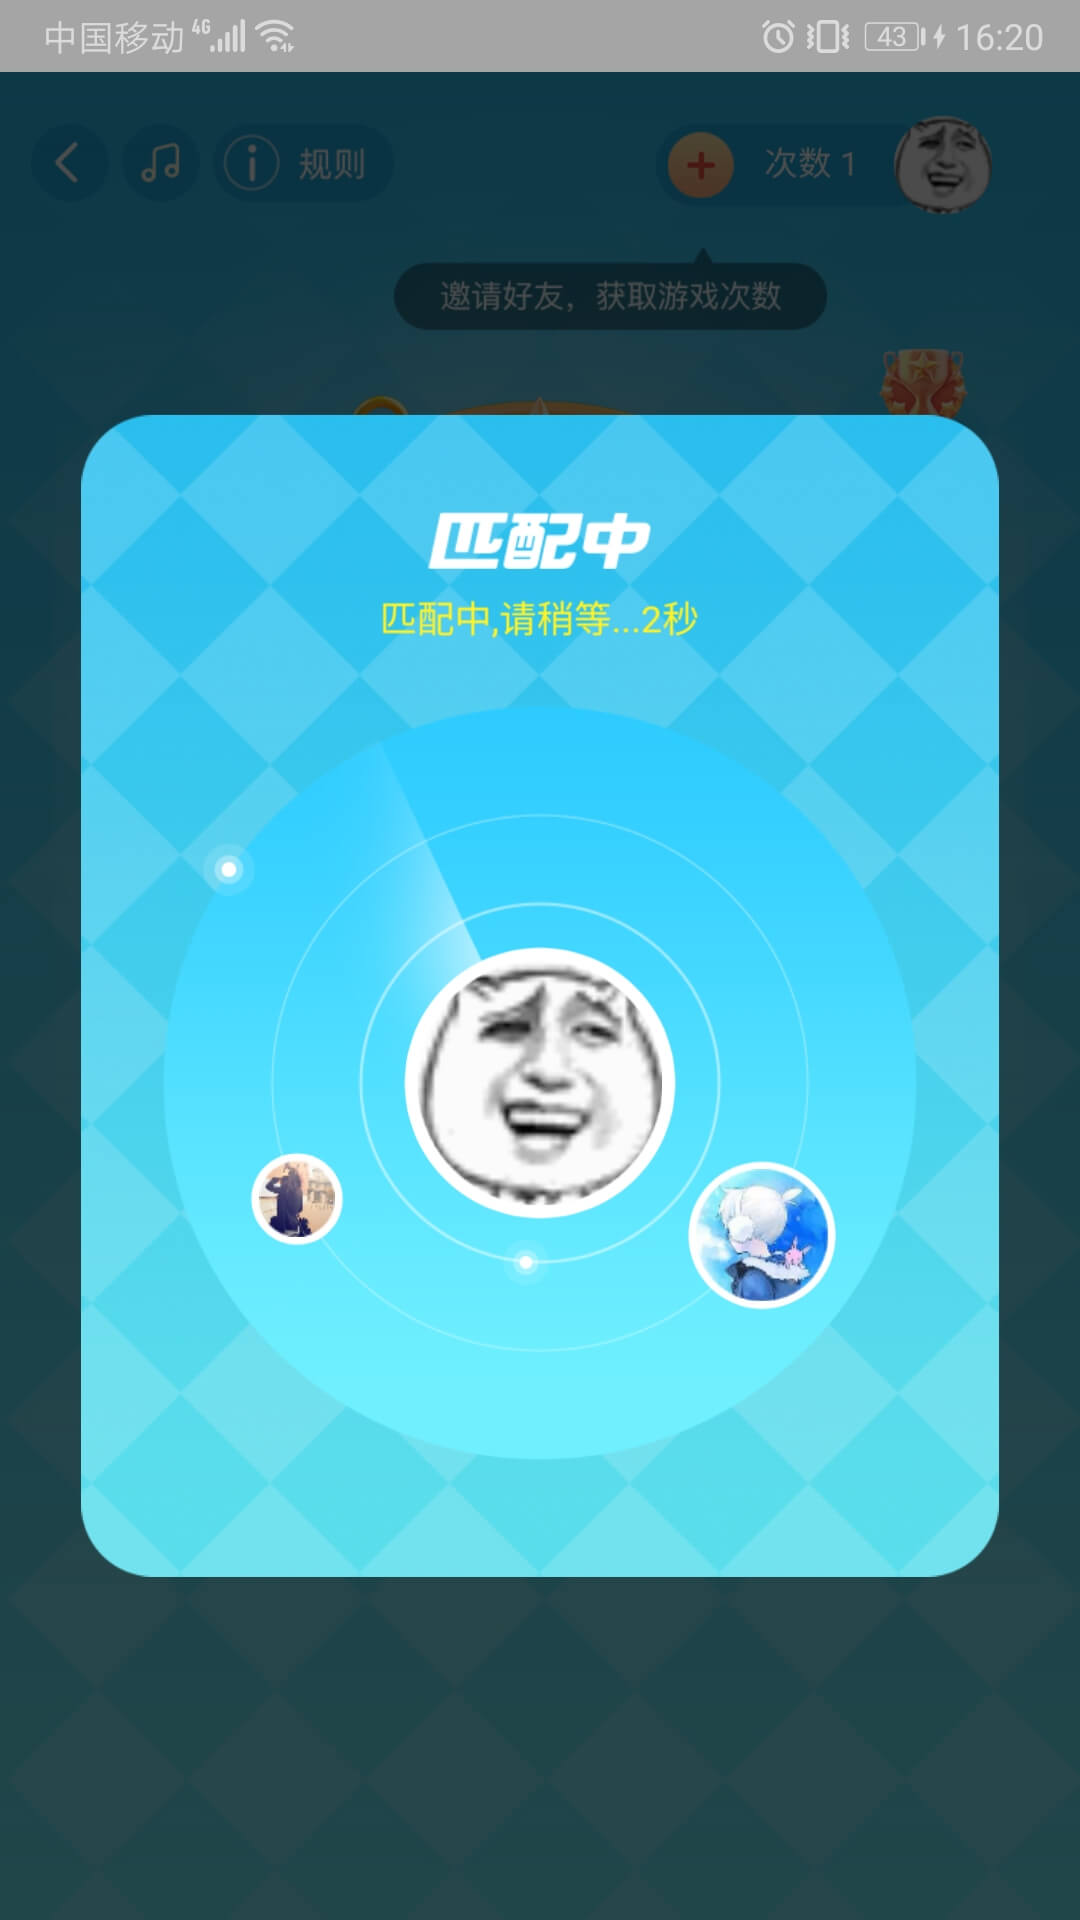 Screenshot_20190814_162047_com.taobao.taobao.jpg